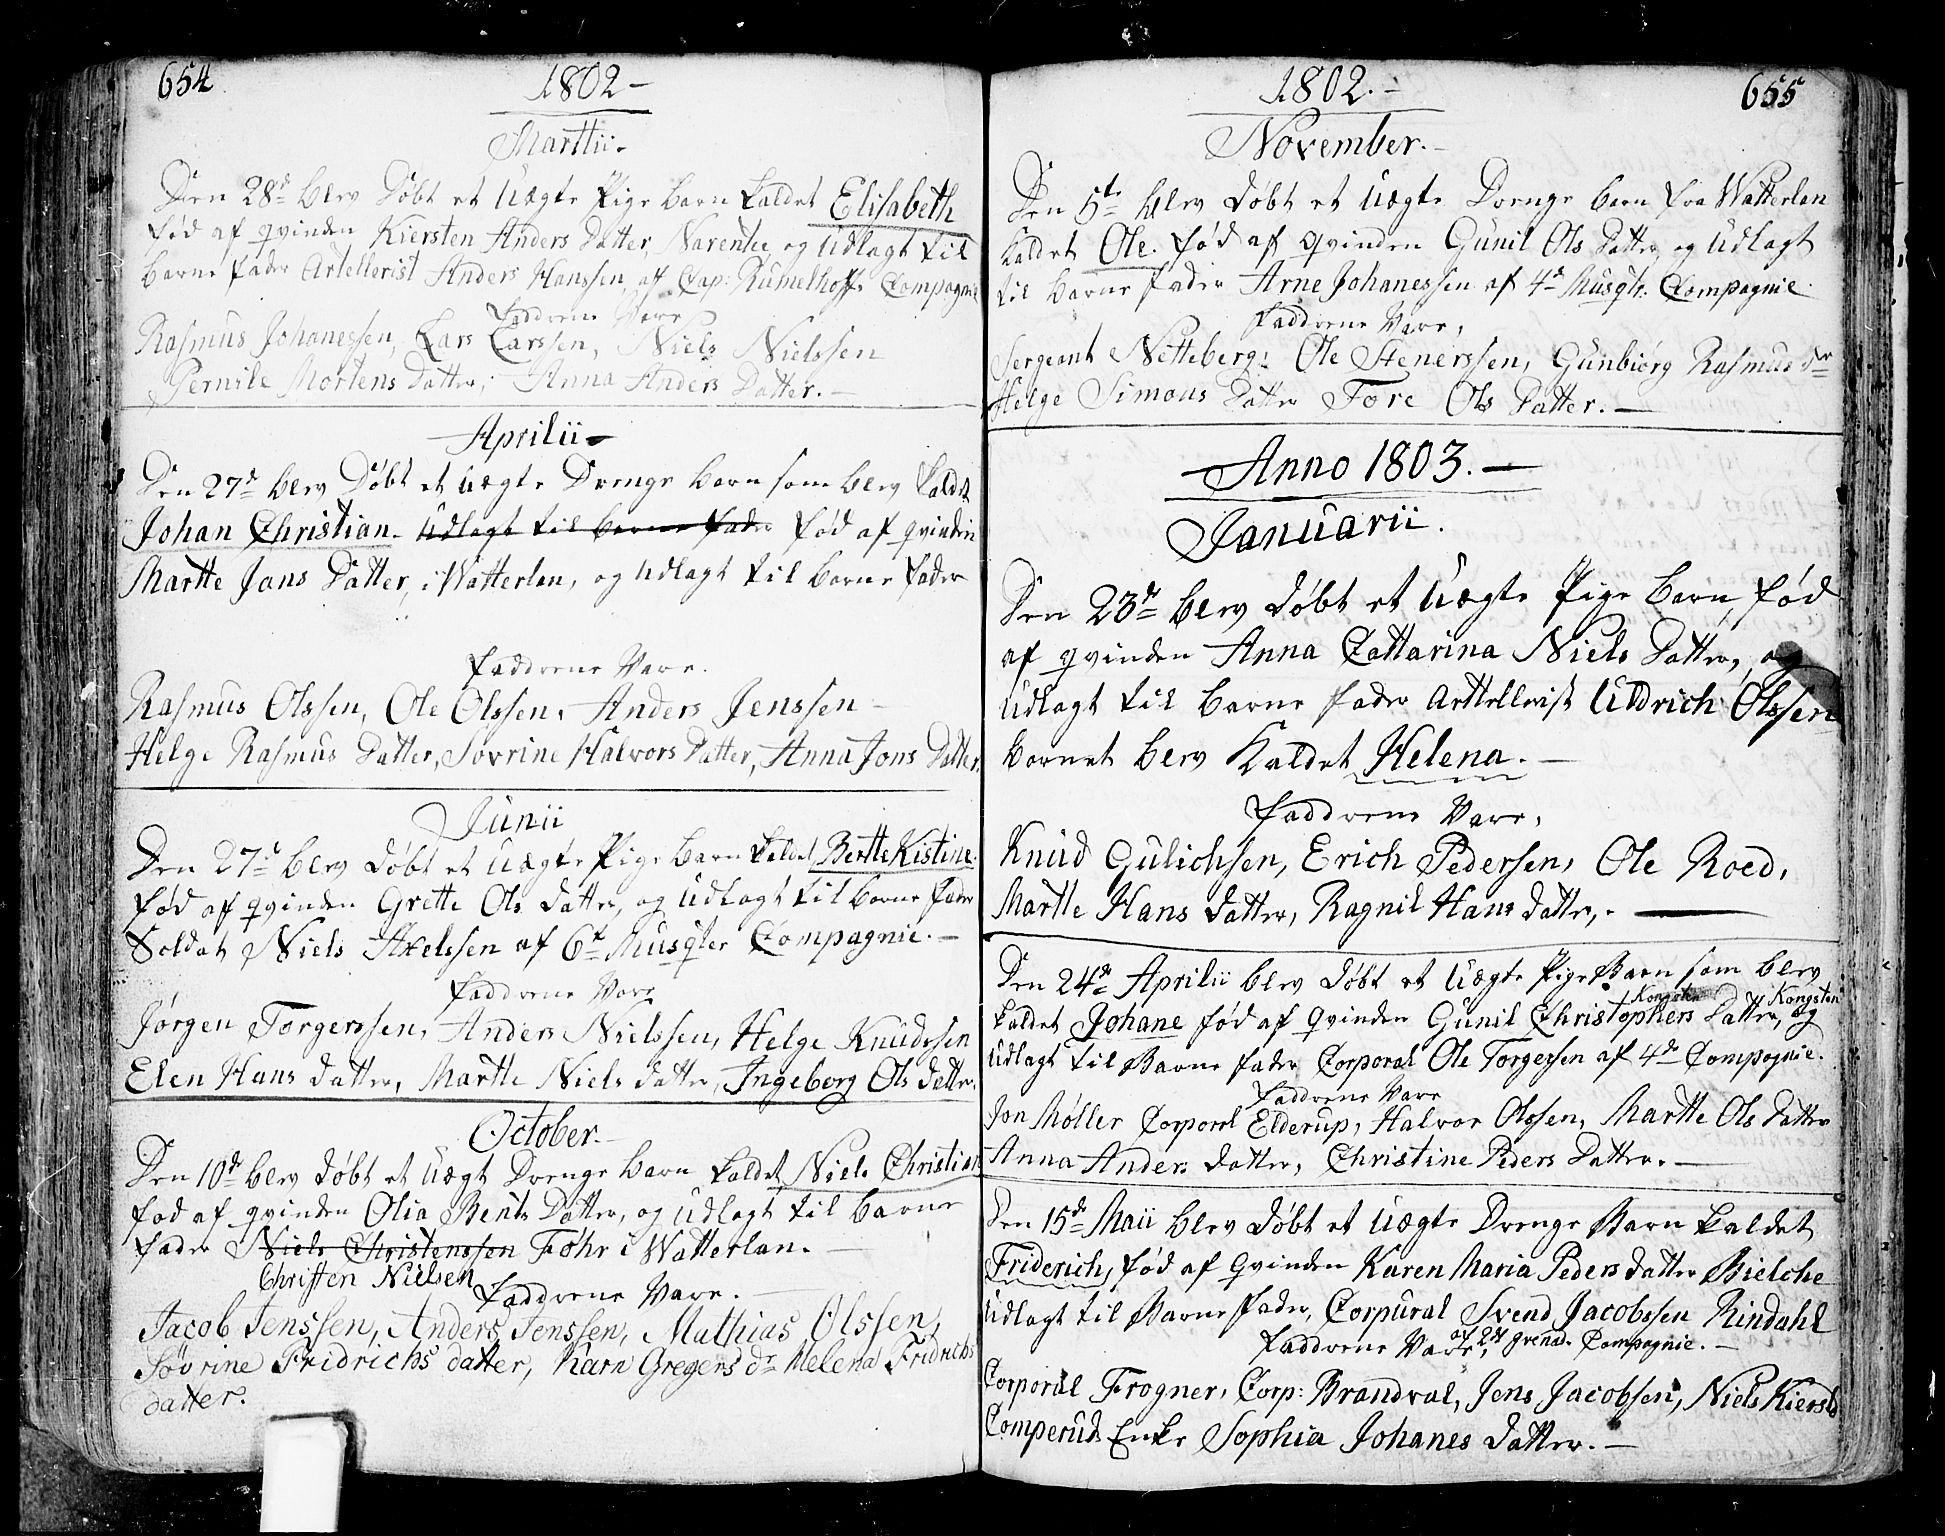 SAO, Fredrikstad prestekontor Kirkebøker, F/Fa/L0002: Ministerialbok nr. 2, 1750-1804, s. 654-655